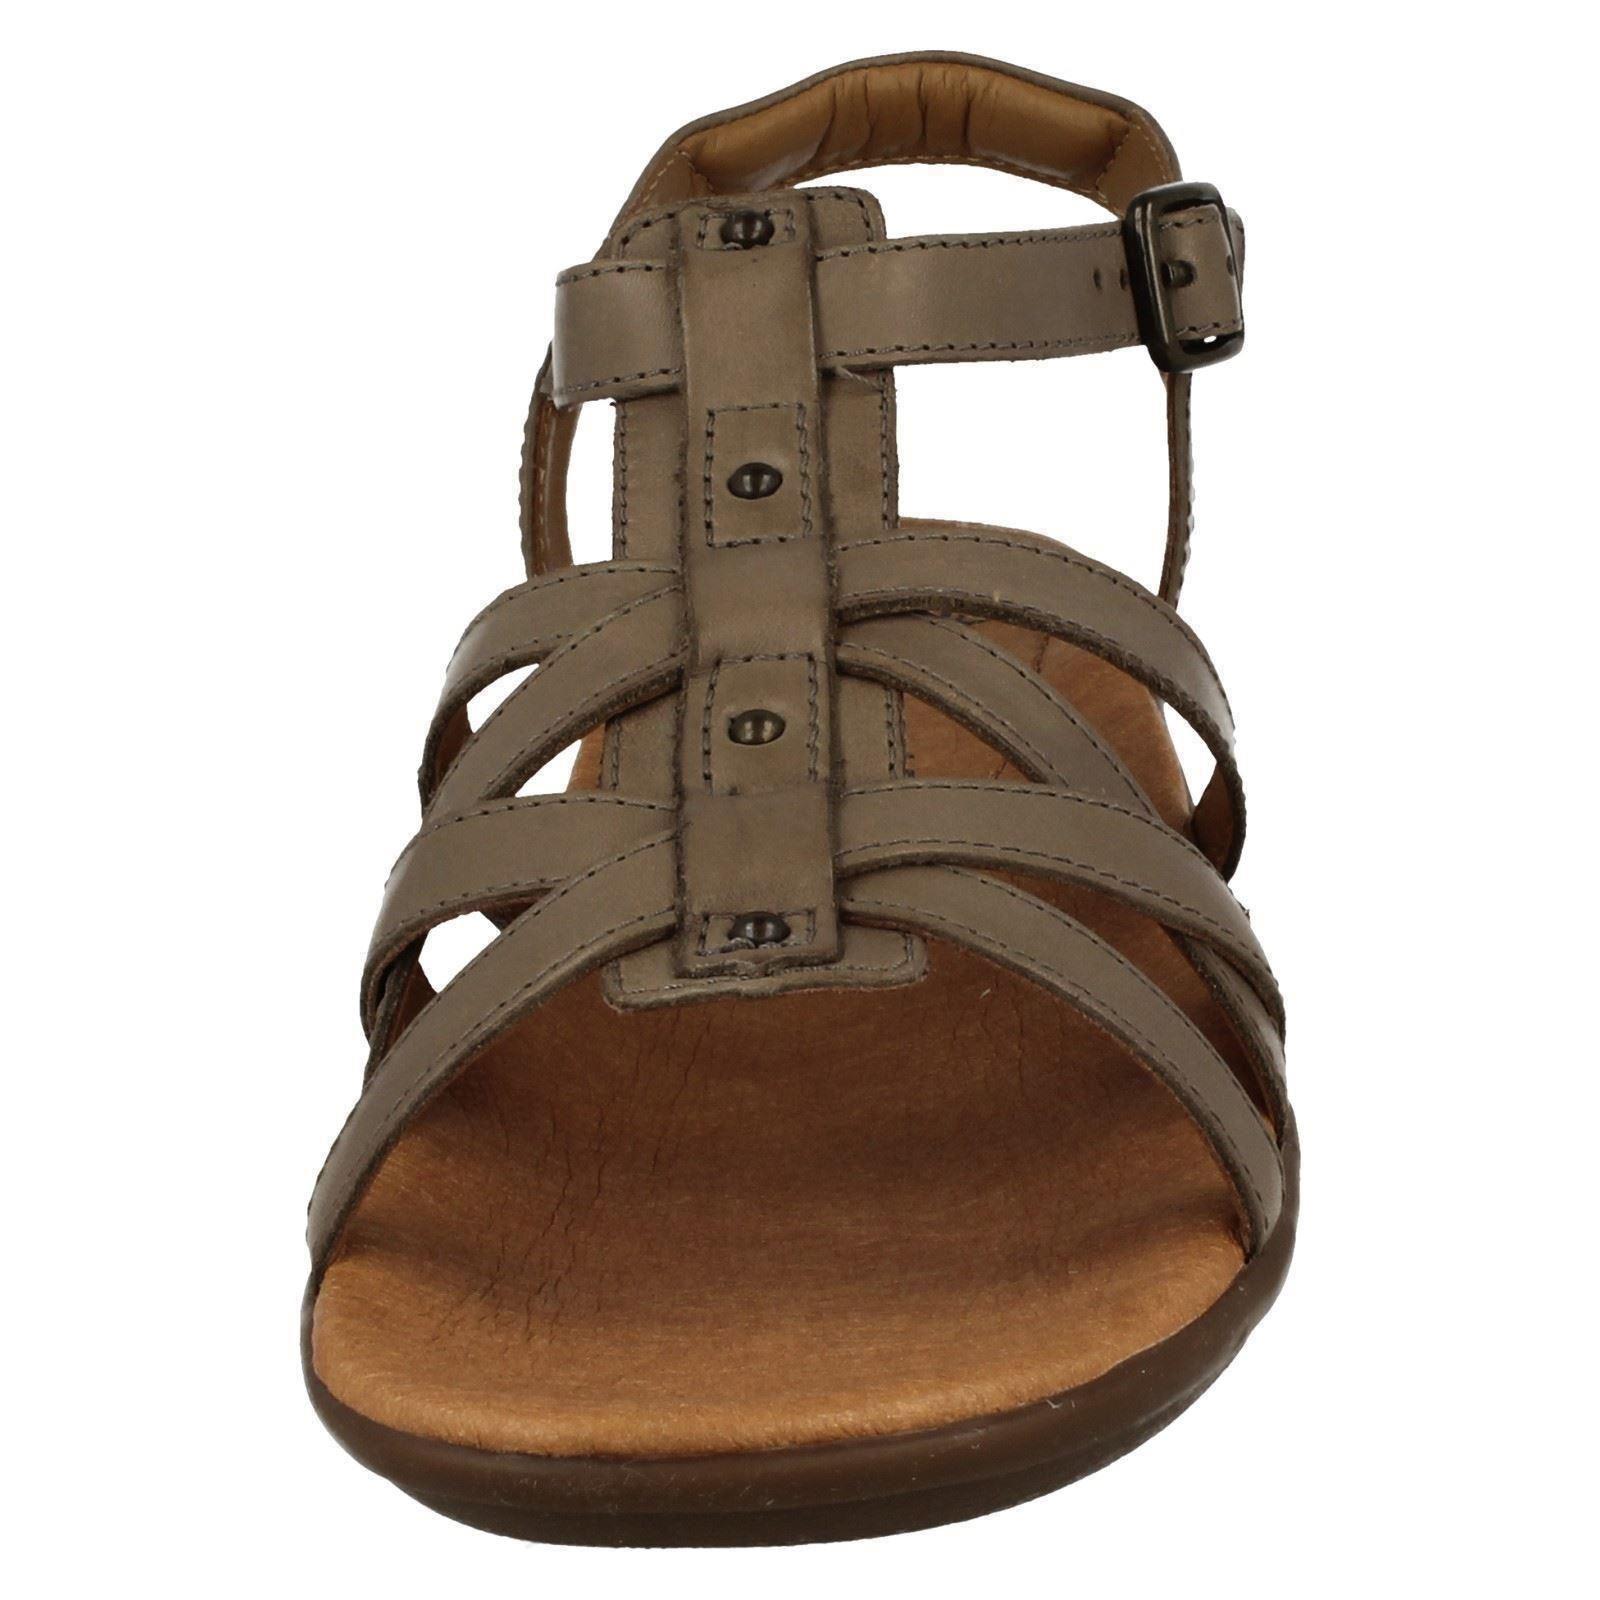 Donna Clarks Sandals Gladiator Style Sandals Clarks - Manilla Bonita 68ddeb